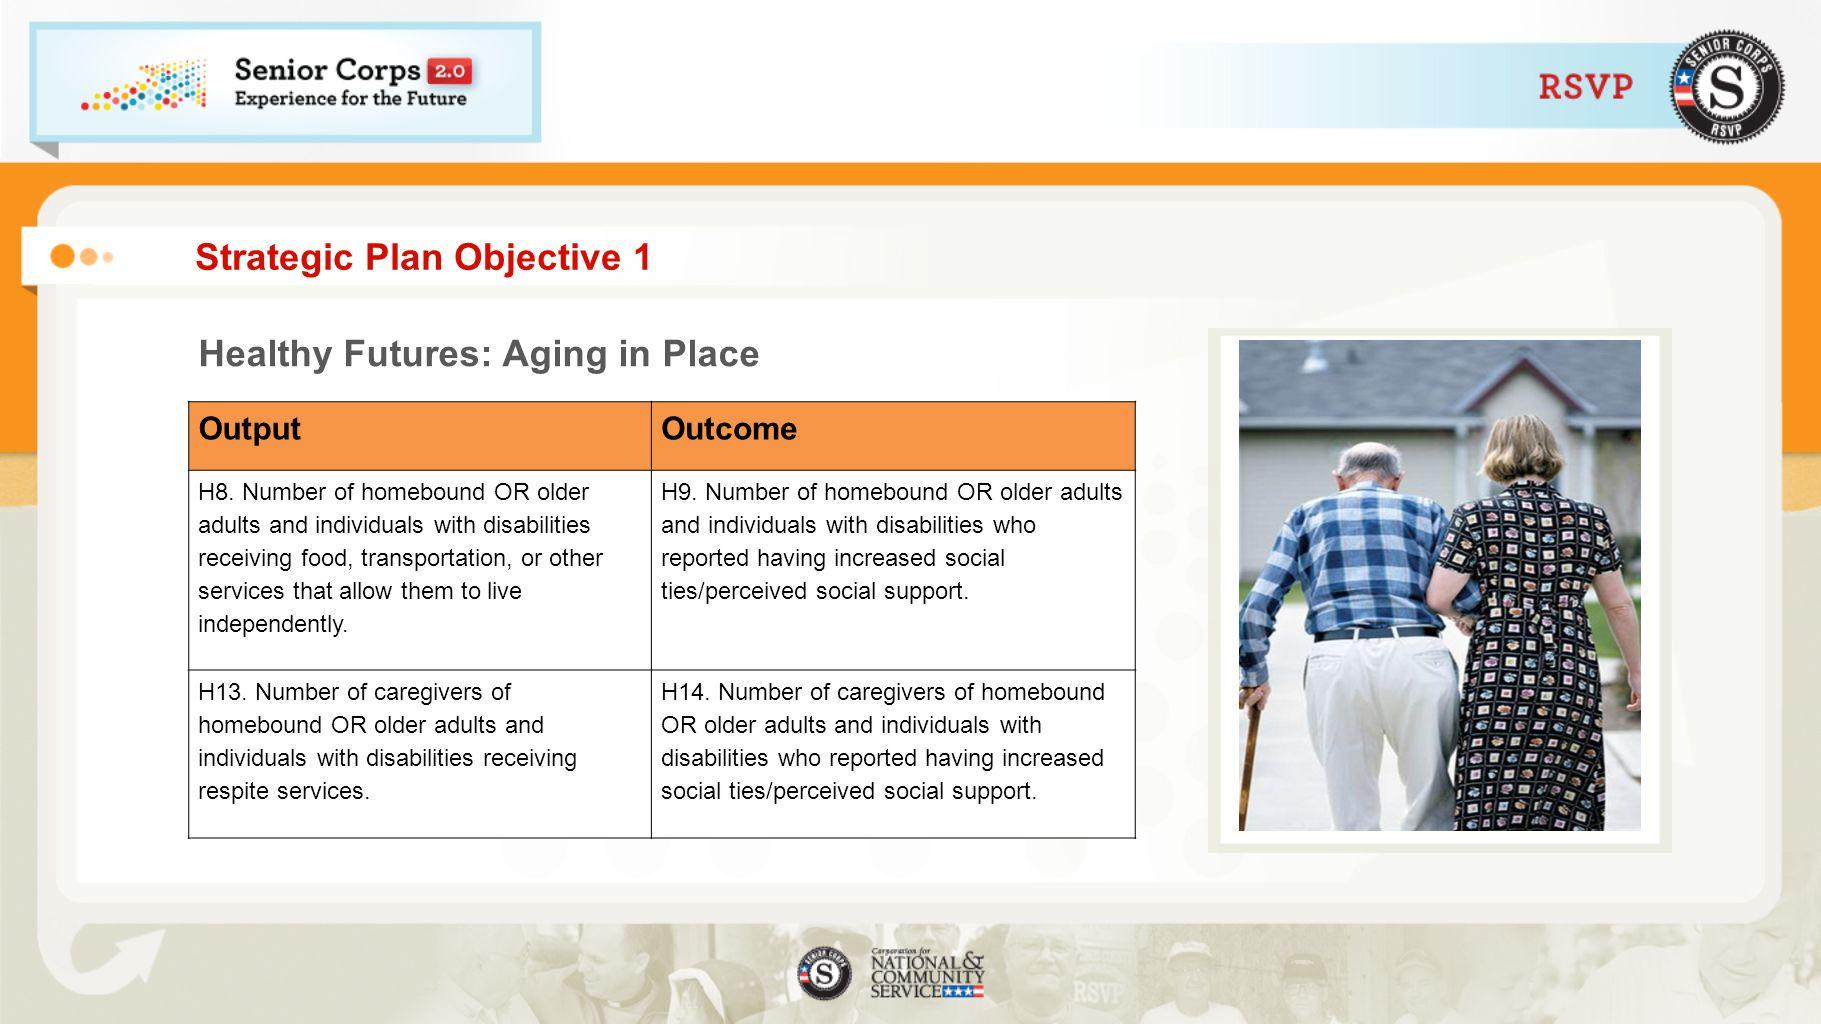 Strategic Plan Objective 1